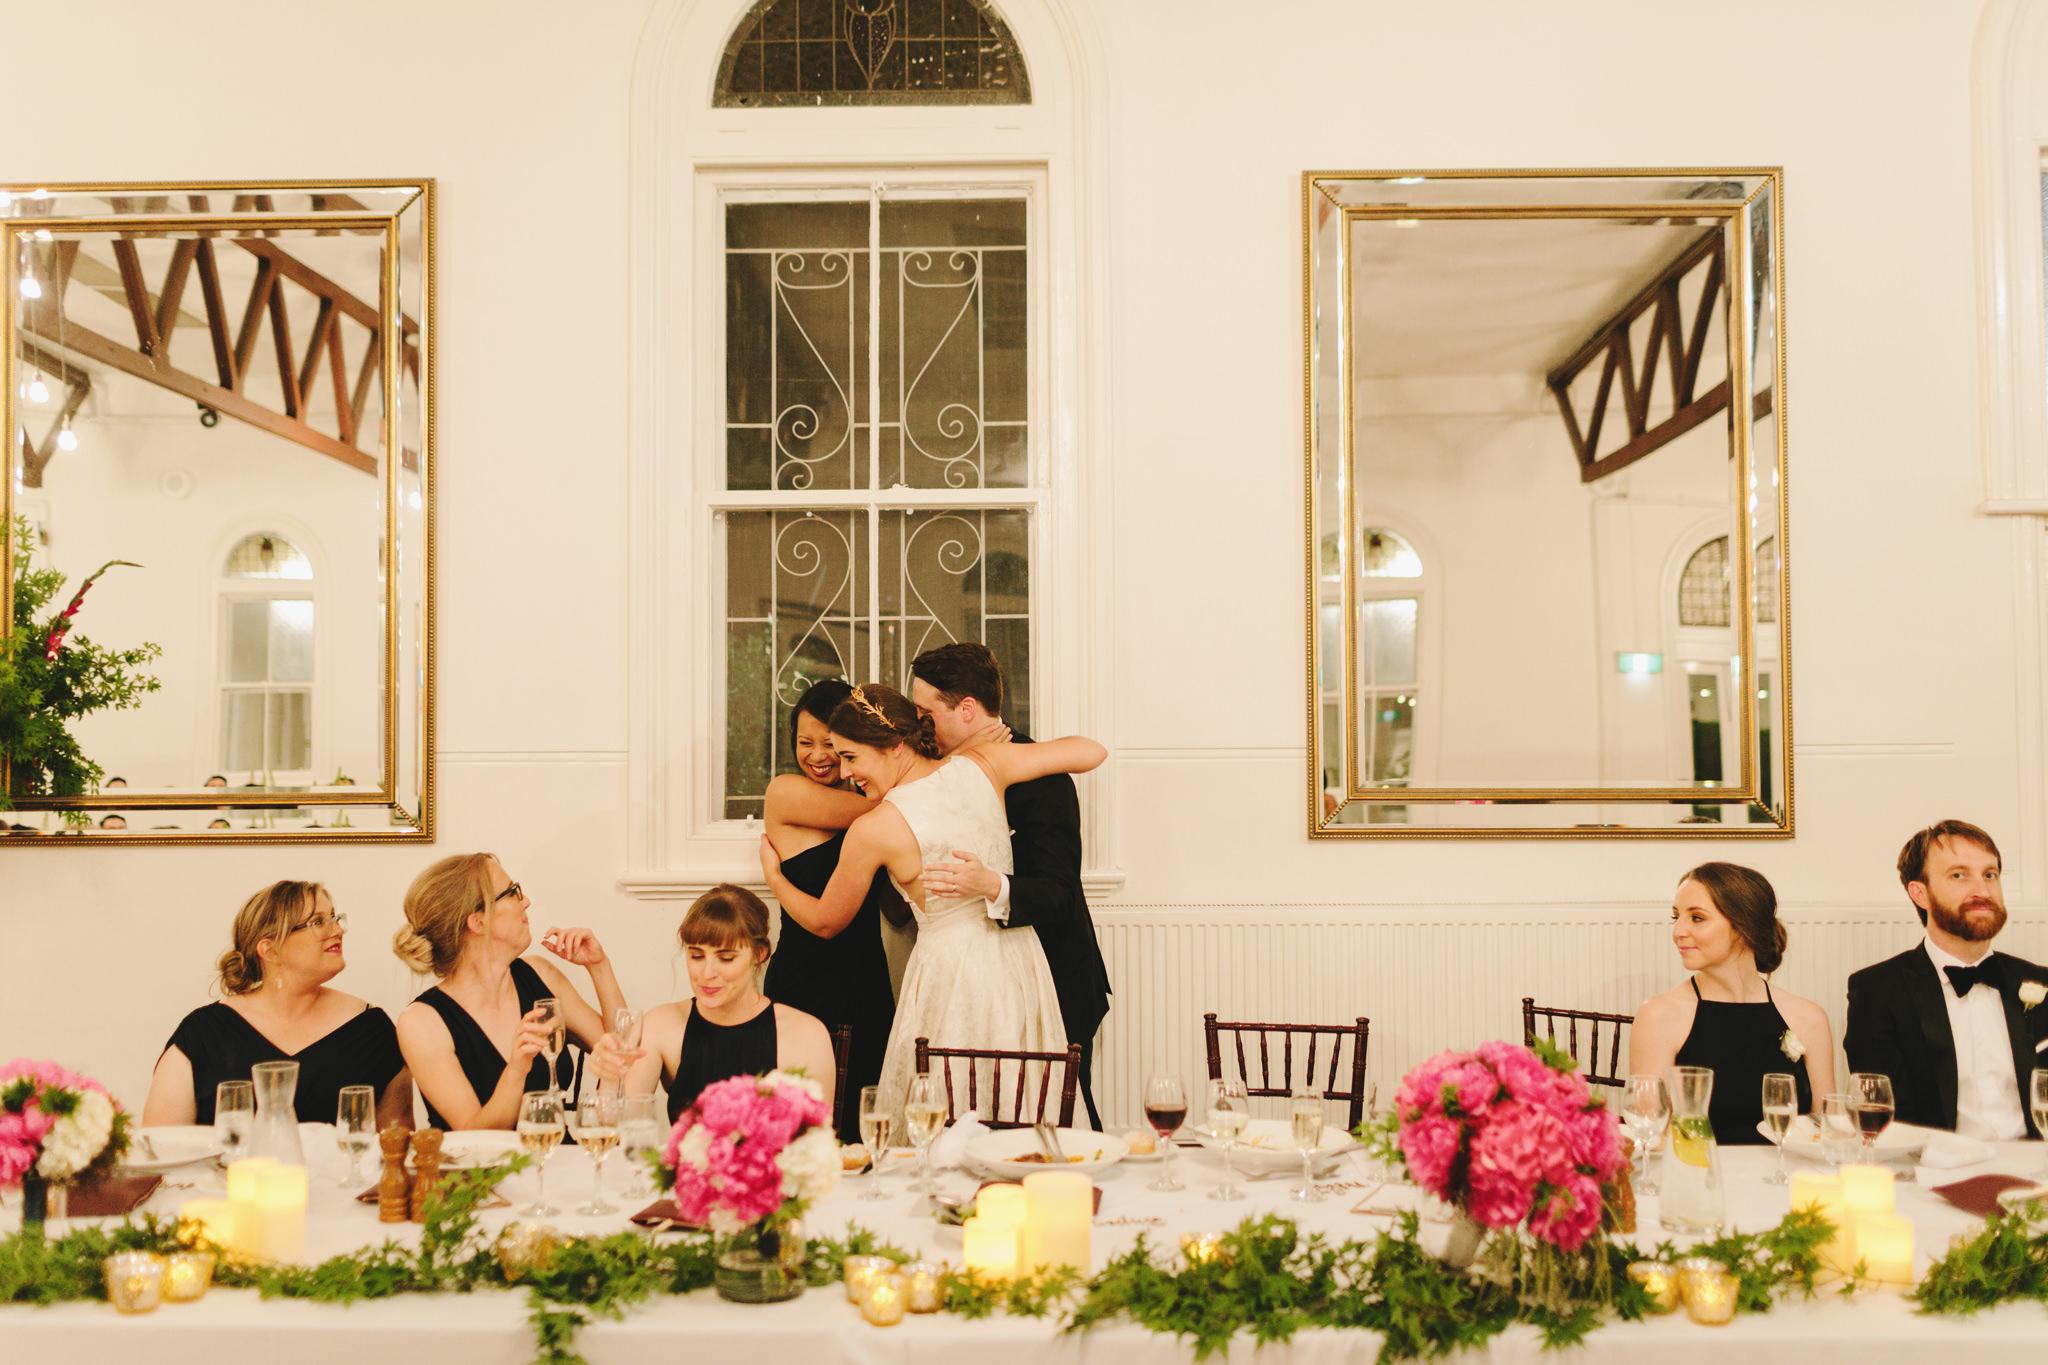 Abbotsford_Convent_Wedding_Peter_Anna118.JPG